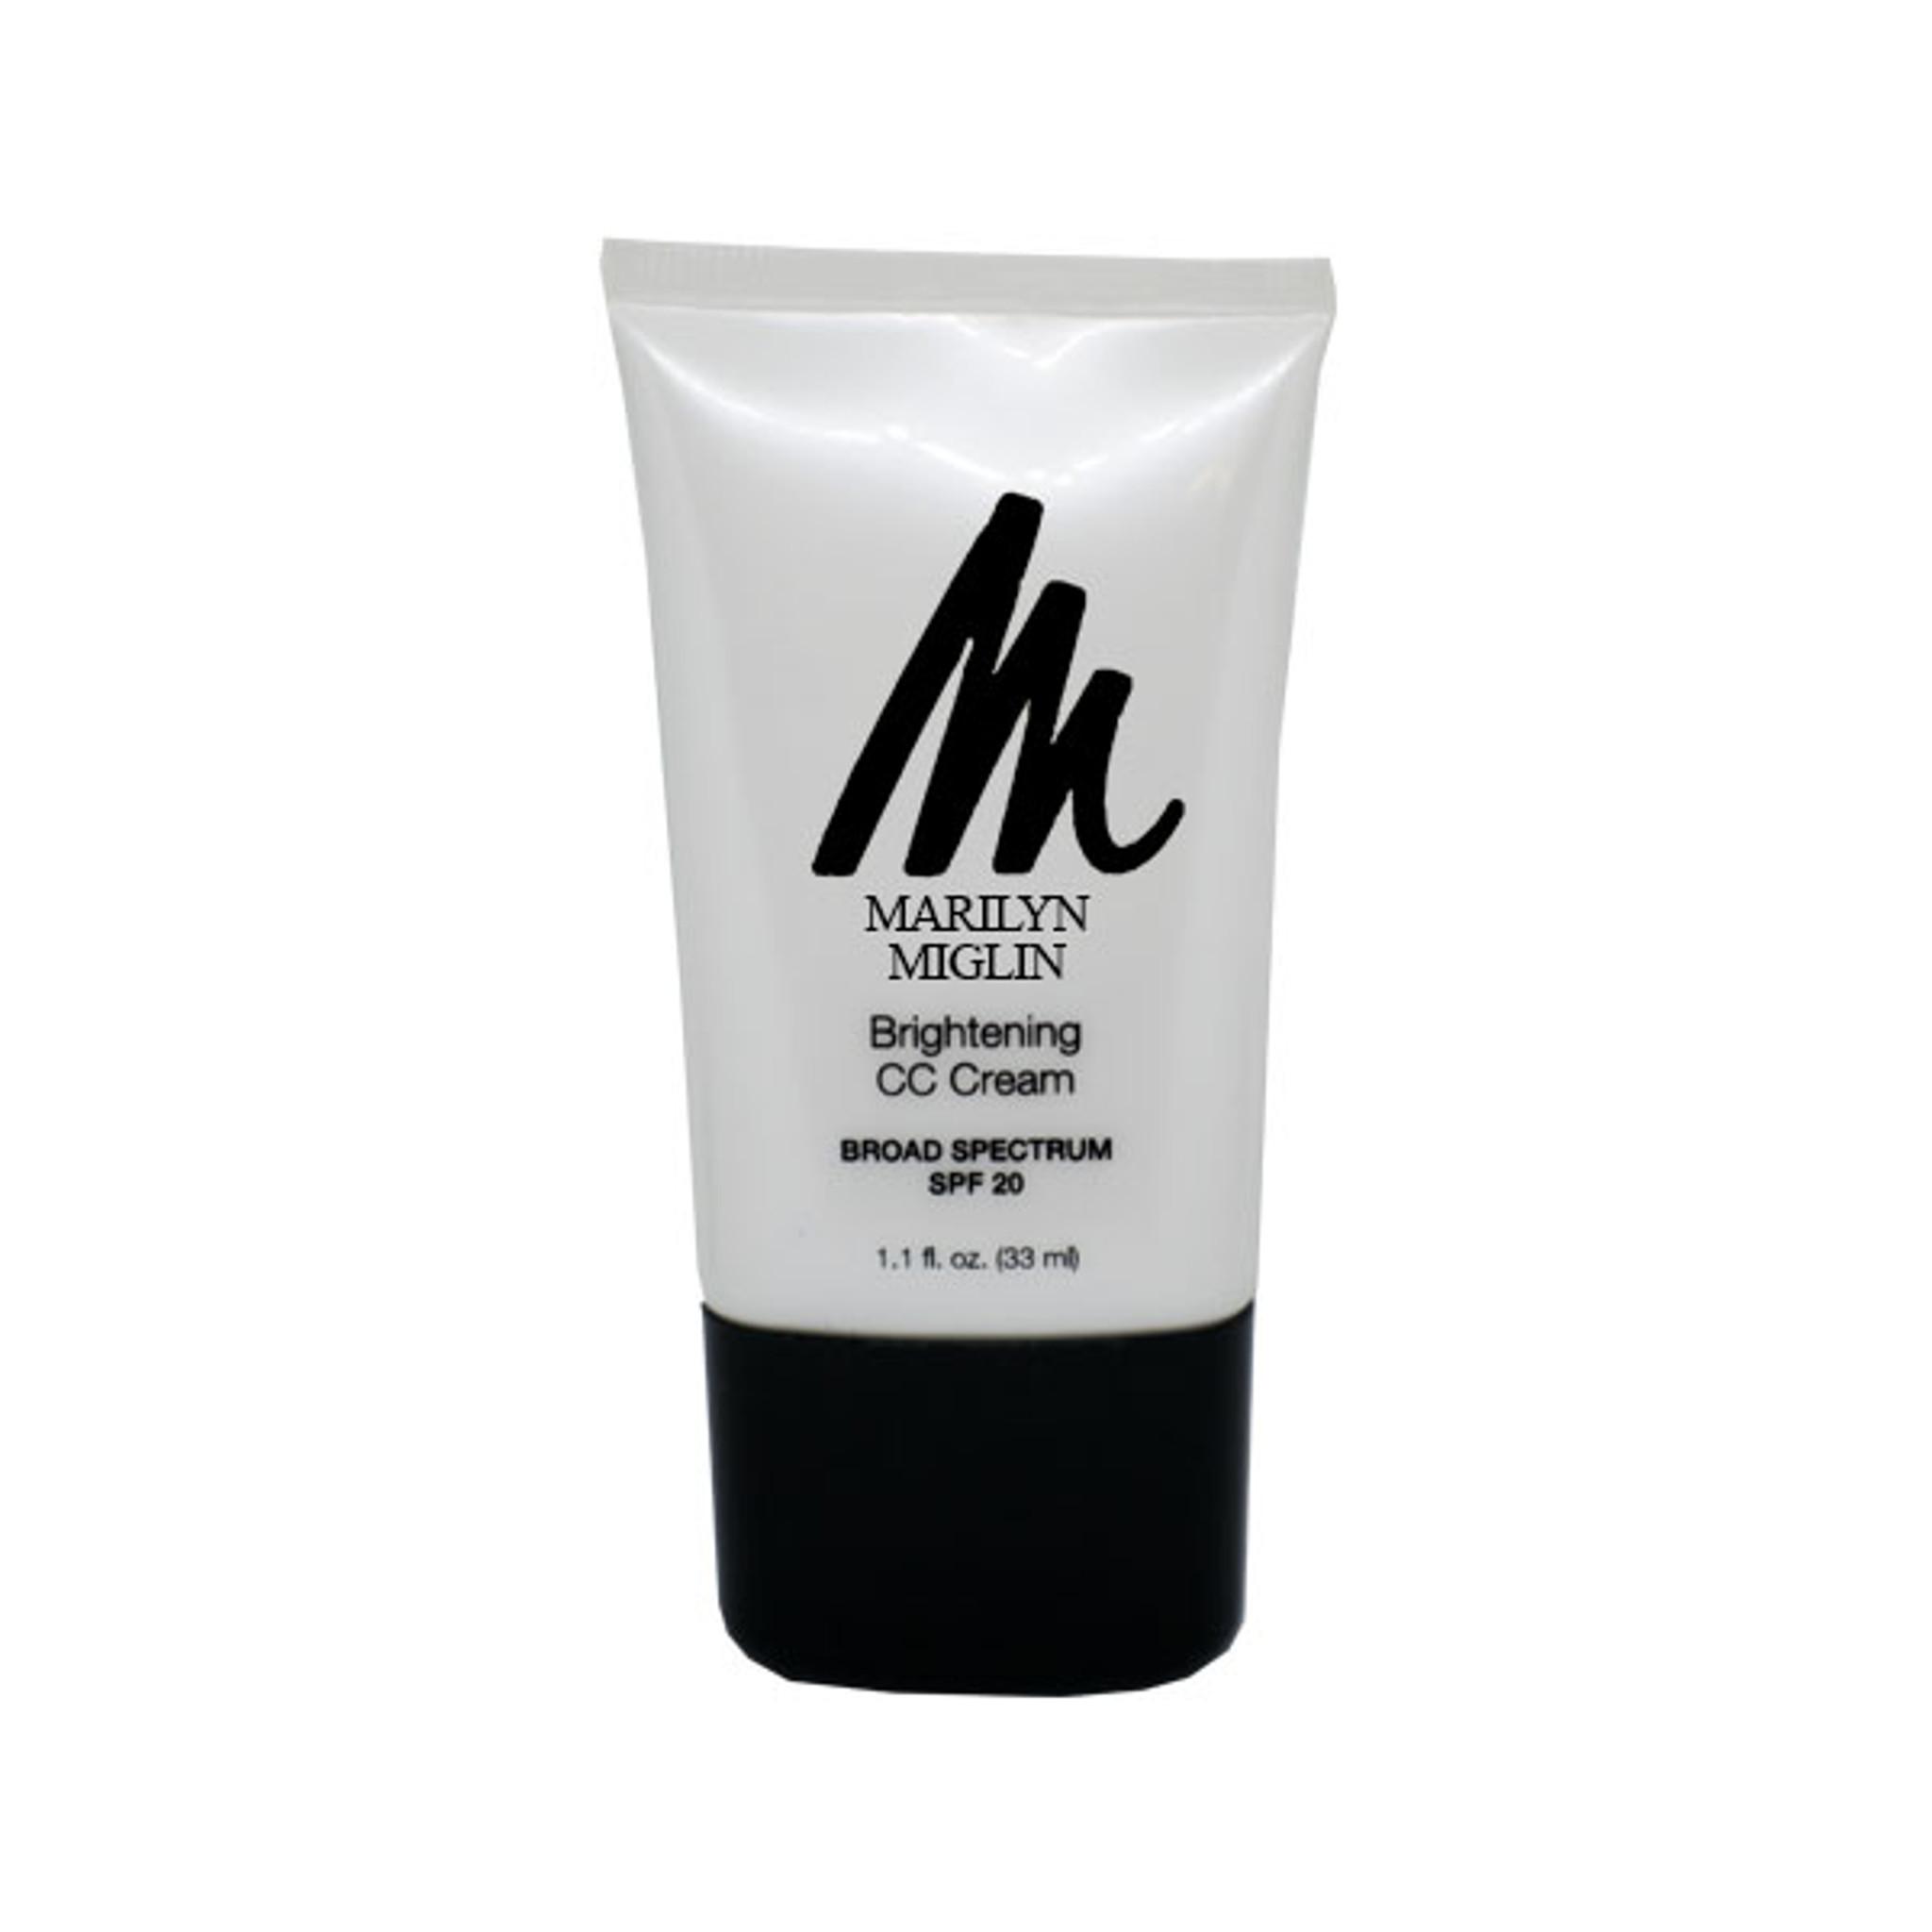 Marilyn Miglin's Brightening CC Cream 1 1 oz